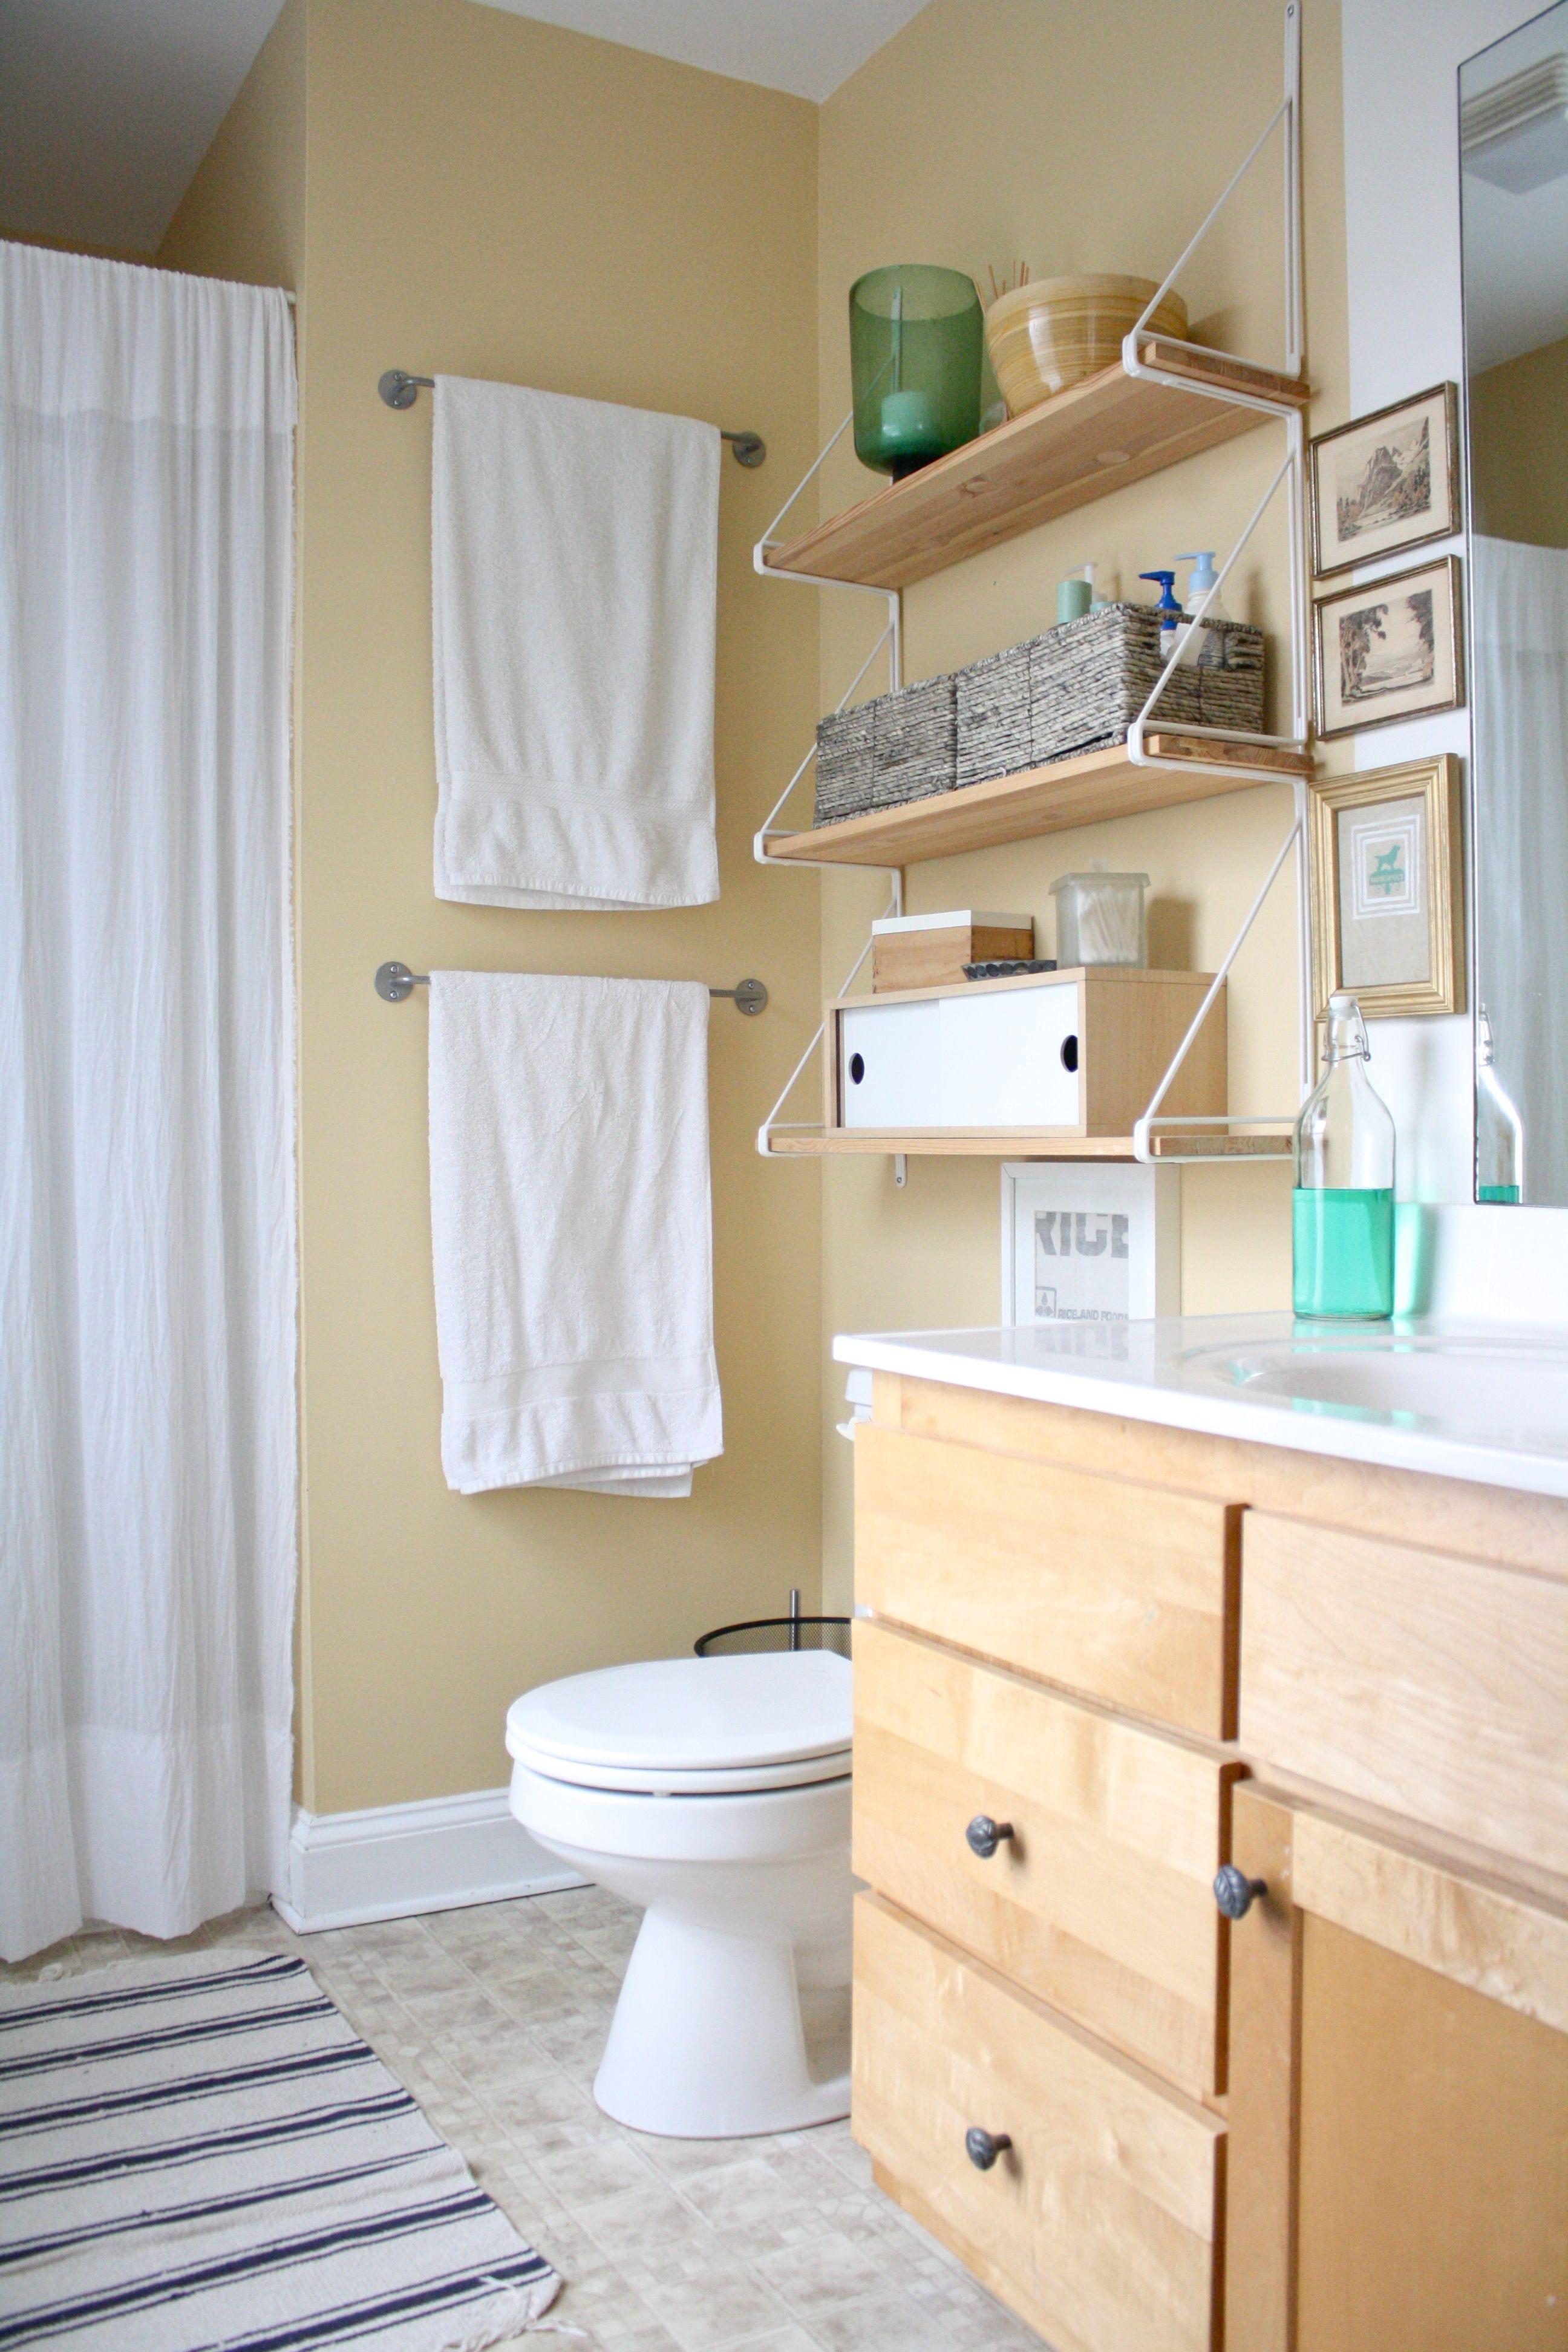 Img 01041 Jpg 2 592 3 888 Pixels Upstairs Bathrooms Bathroom Design Ikea Bathroom Shelves